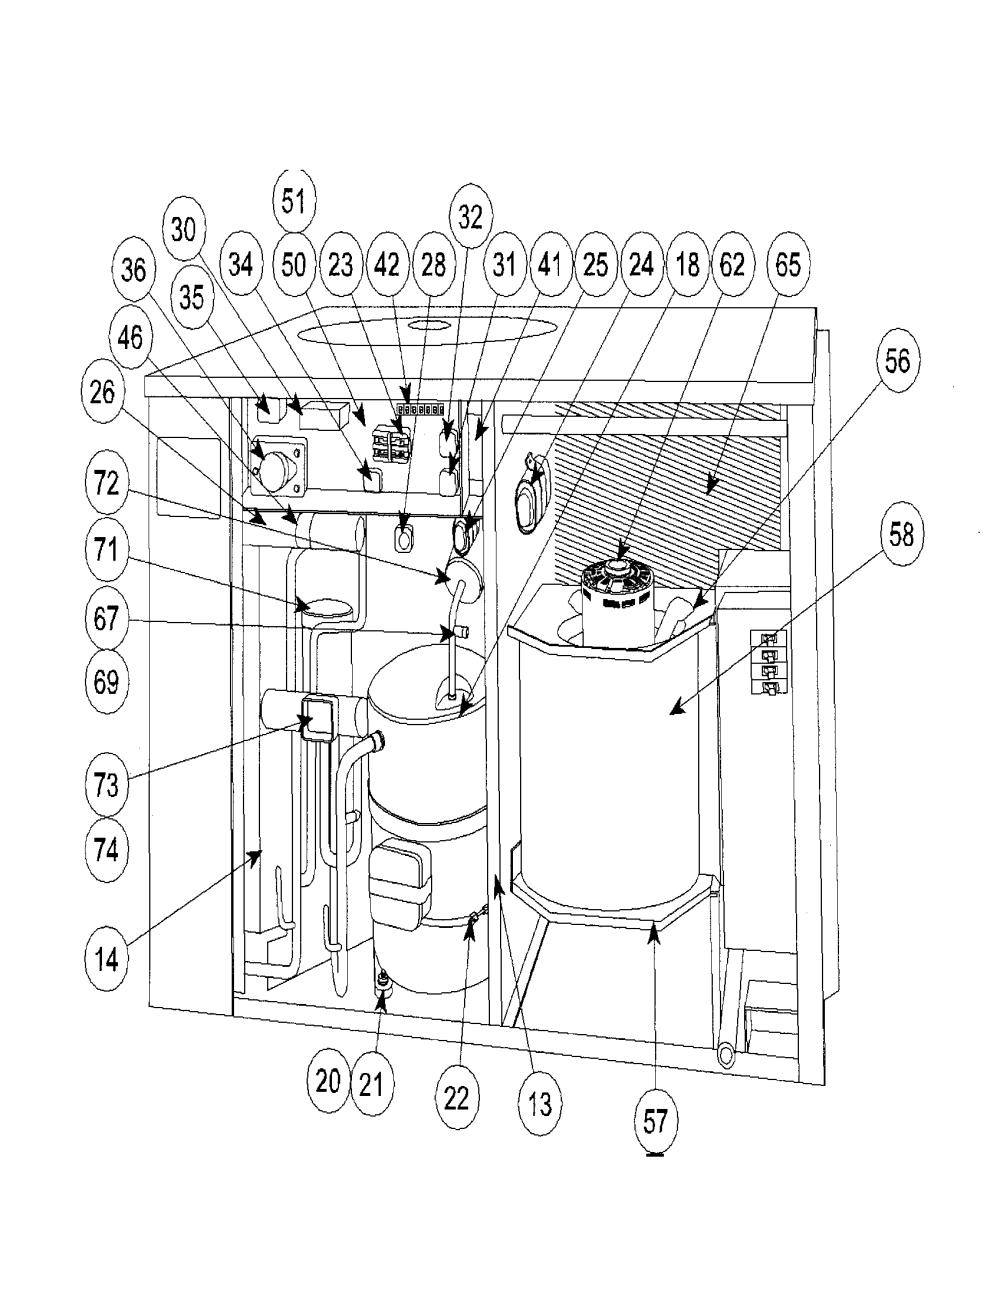 medium resolution of carrier heat pump diagram wiring diagrams scematic heat pump parts carrier heat pump diagram